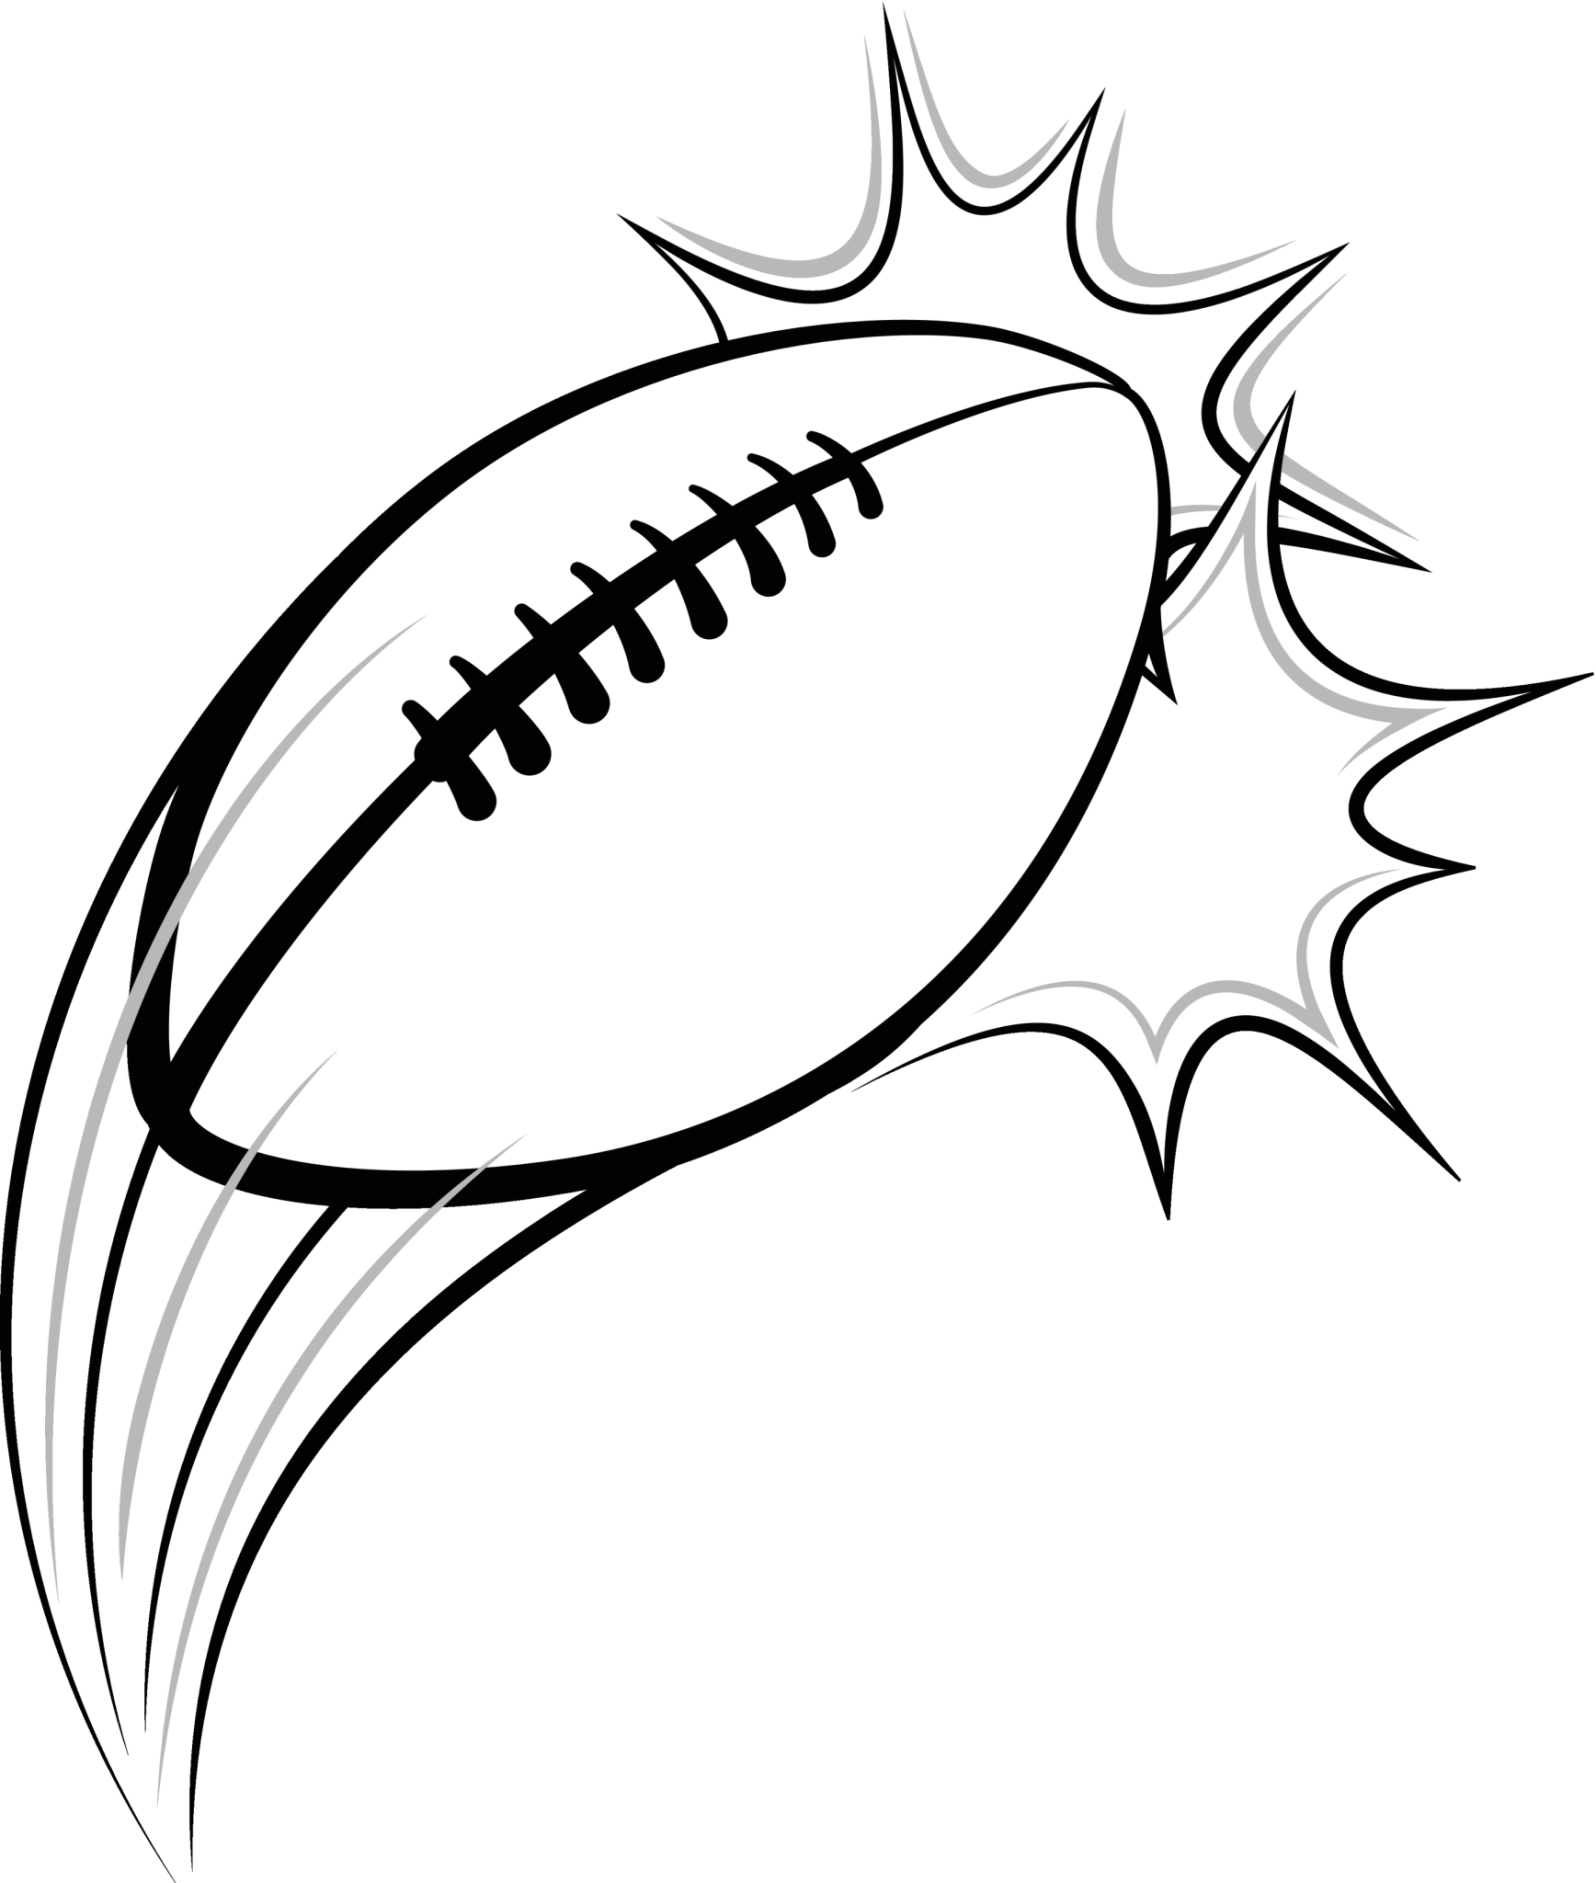 1596x1883 Cool Football Drawings Group